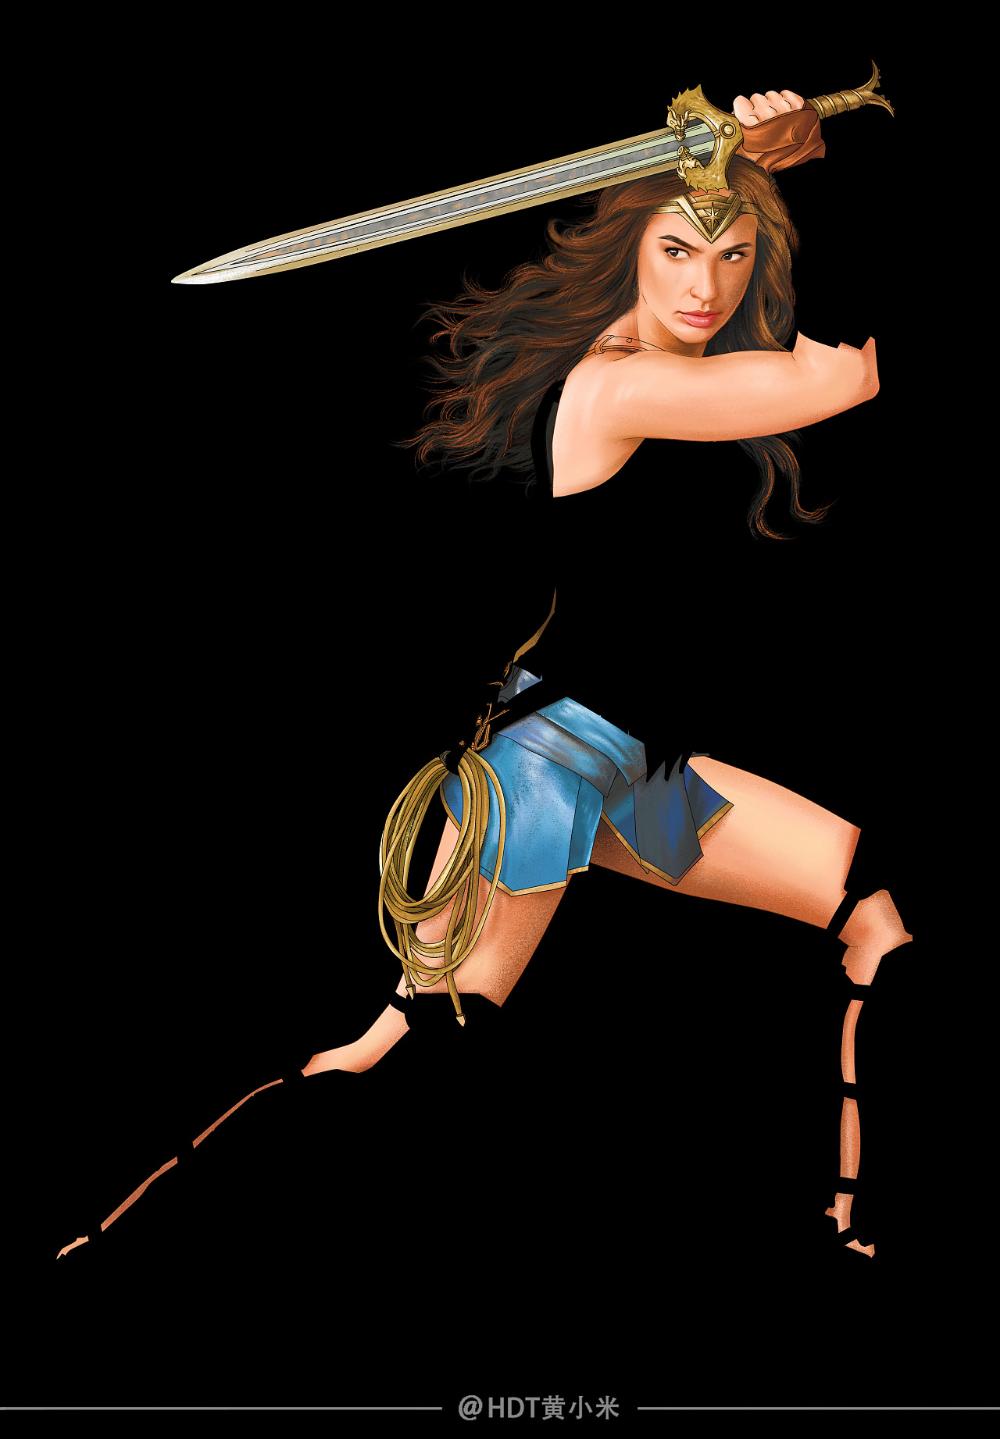 Wonder Woman Illustration Woman Illustration Wonder Woman Women